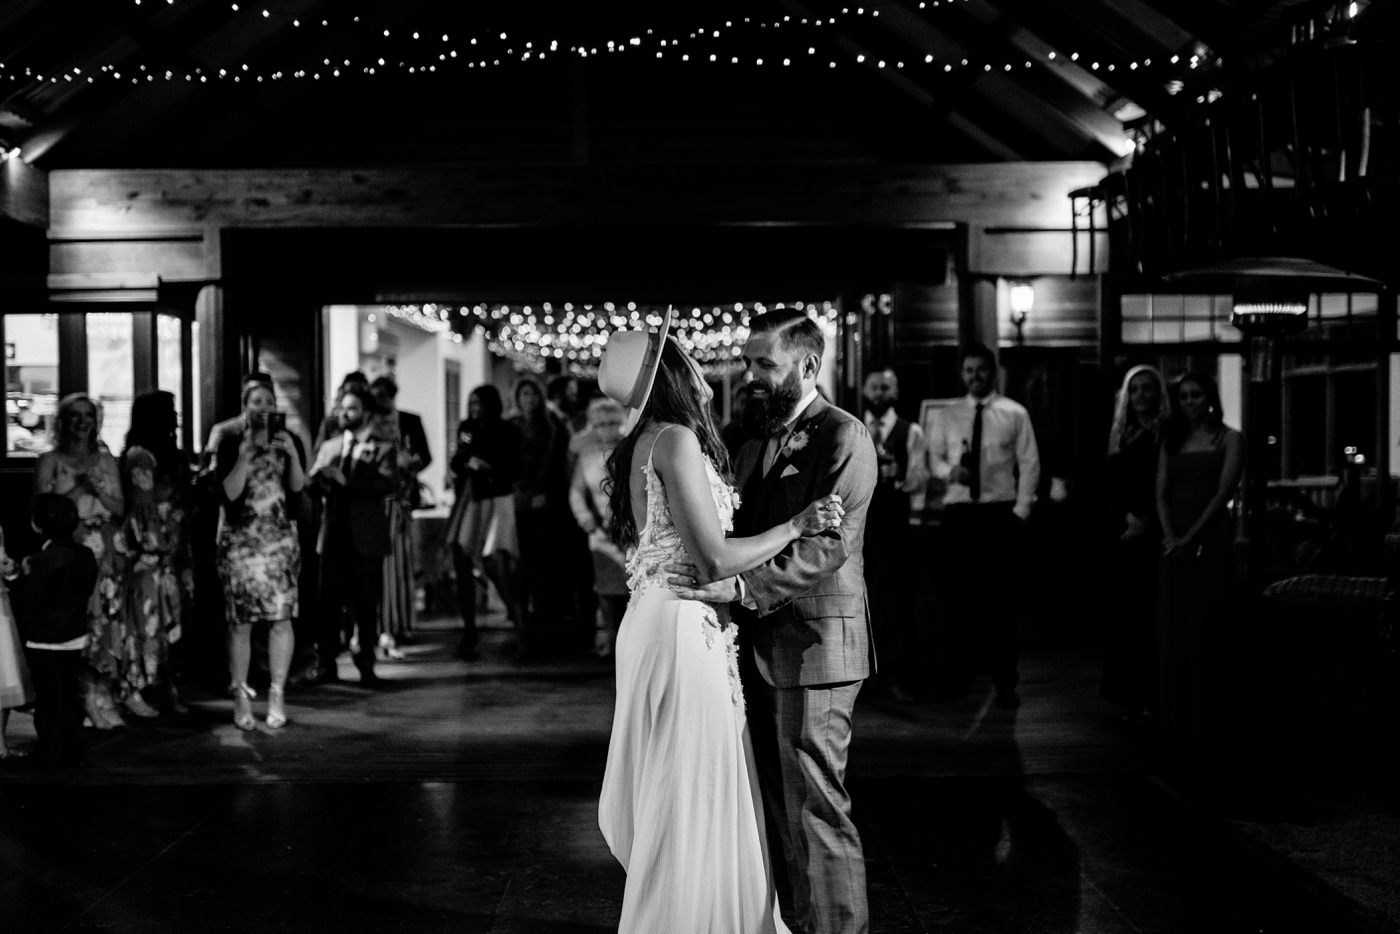 Maddy & Wes - K1 by Geoff Hardy Wedding - Adelaide Wedding Photographer - Natural wedding photography in Adelaide - Katherine Schultz_0085.jpg